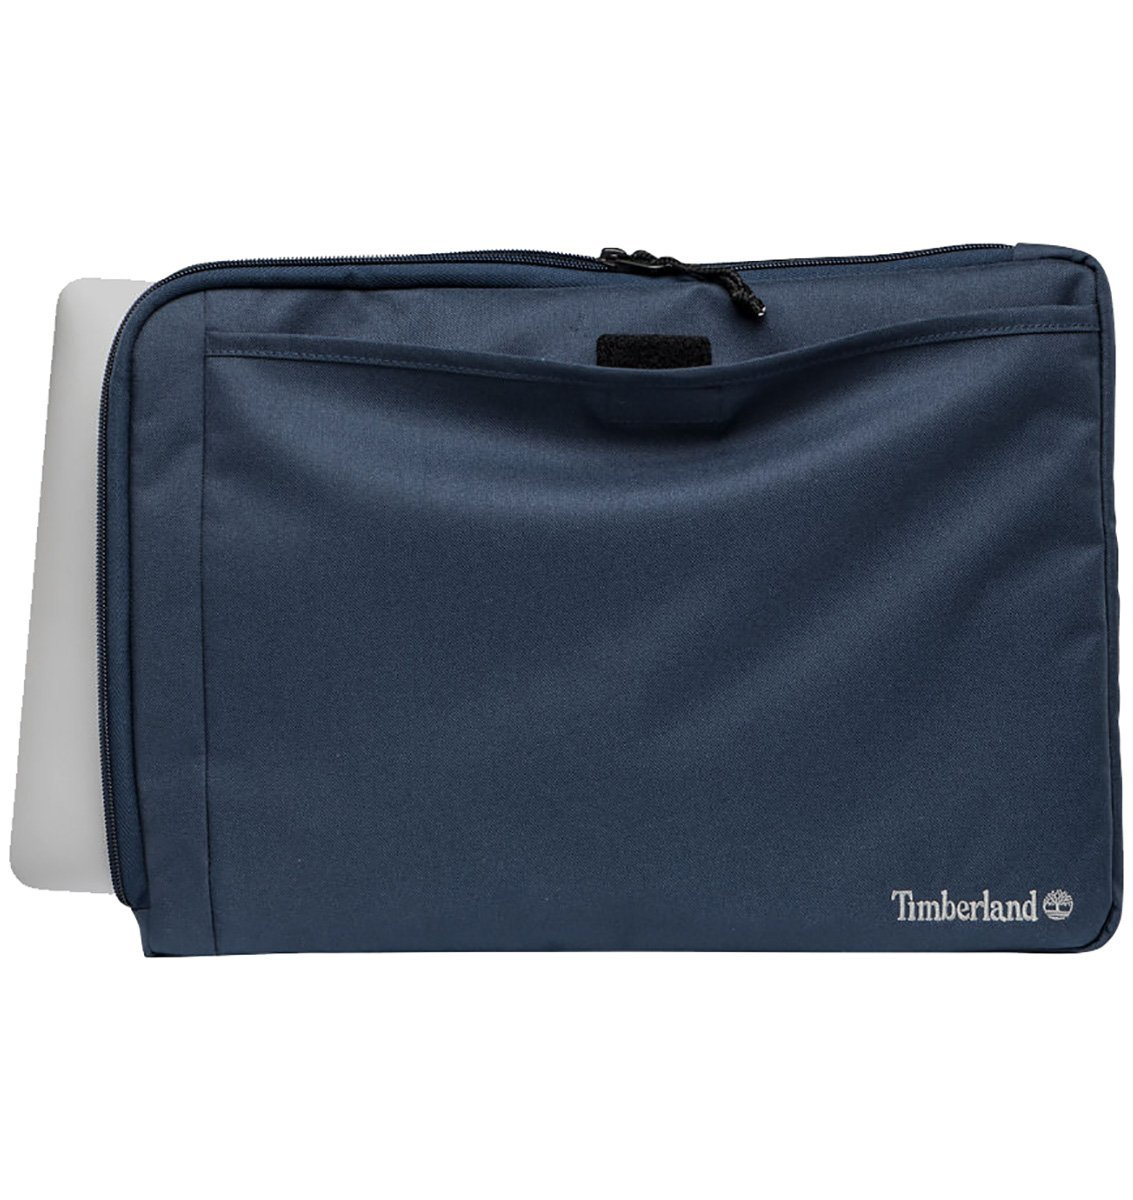 Timberland Crofton Water-resistant Laptop Sleeve